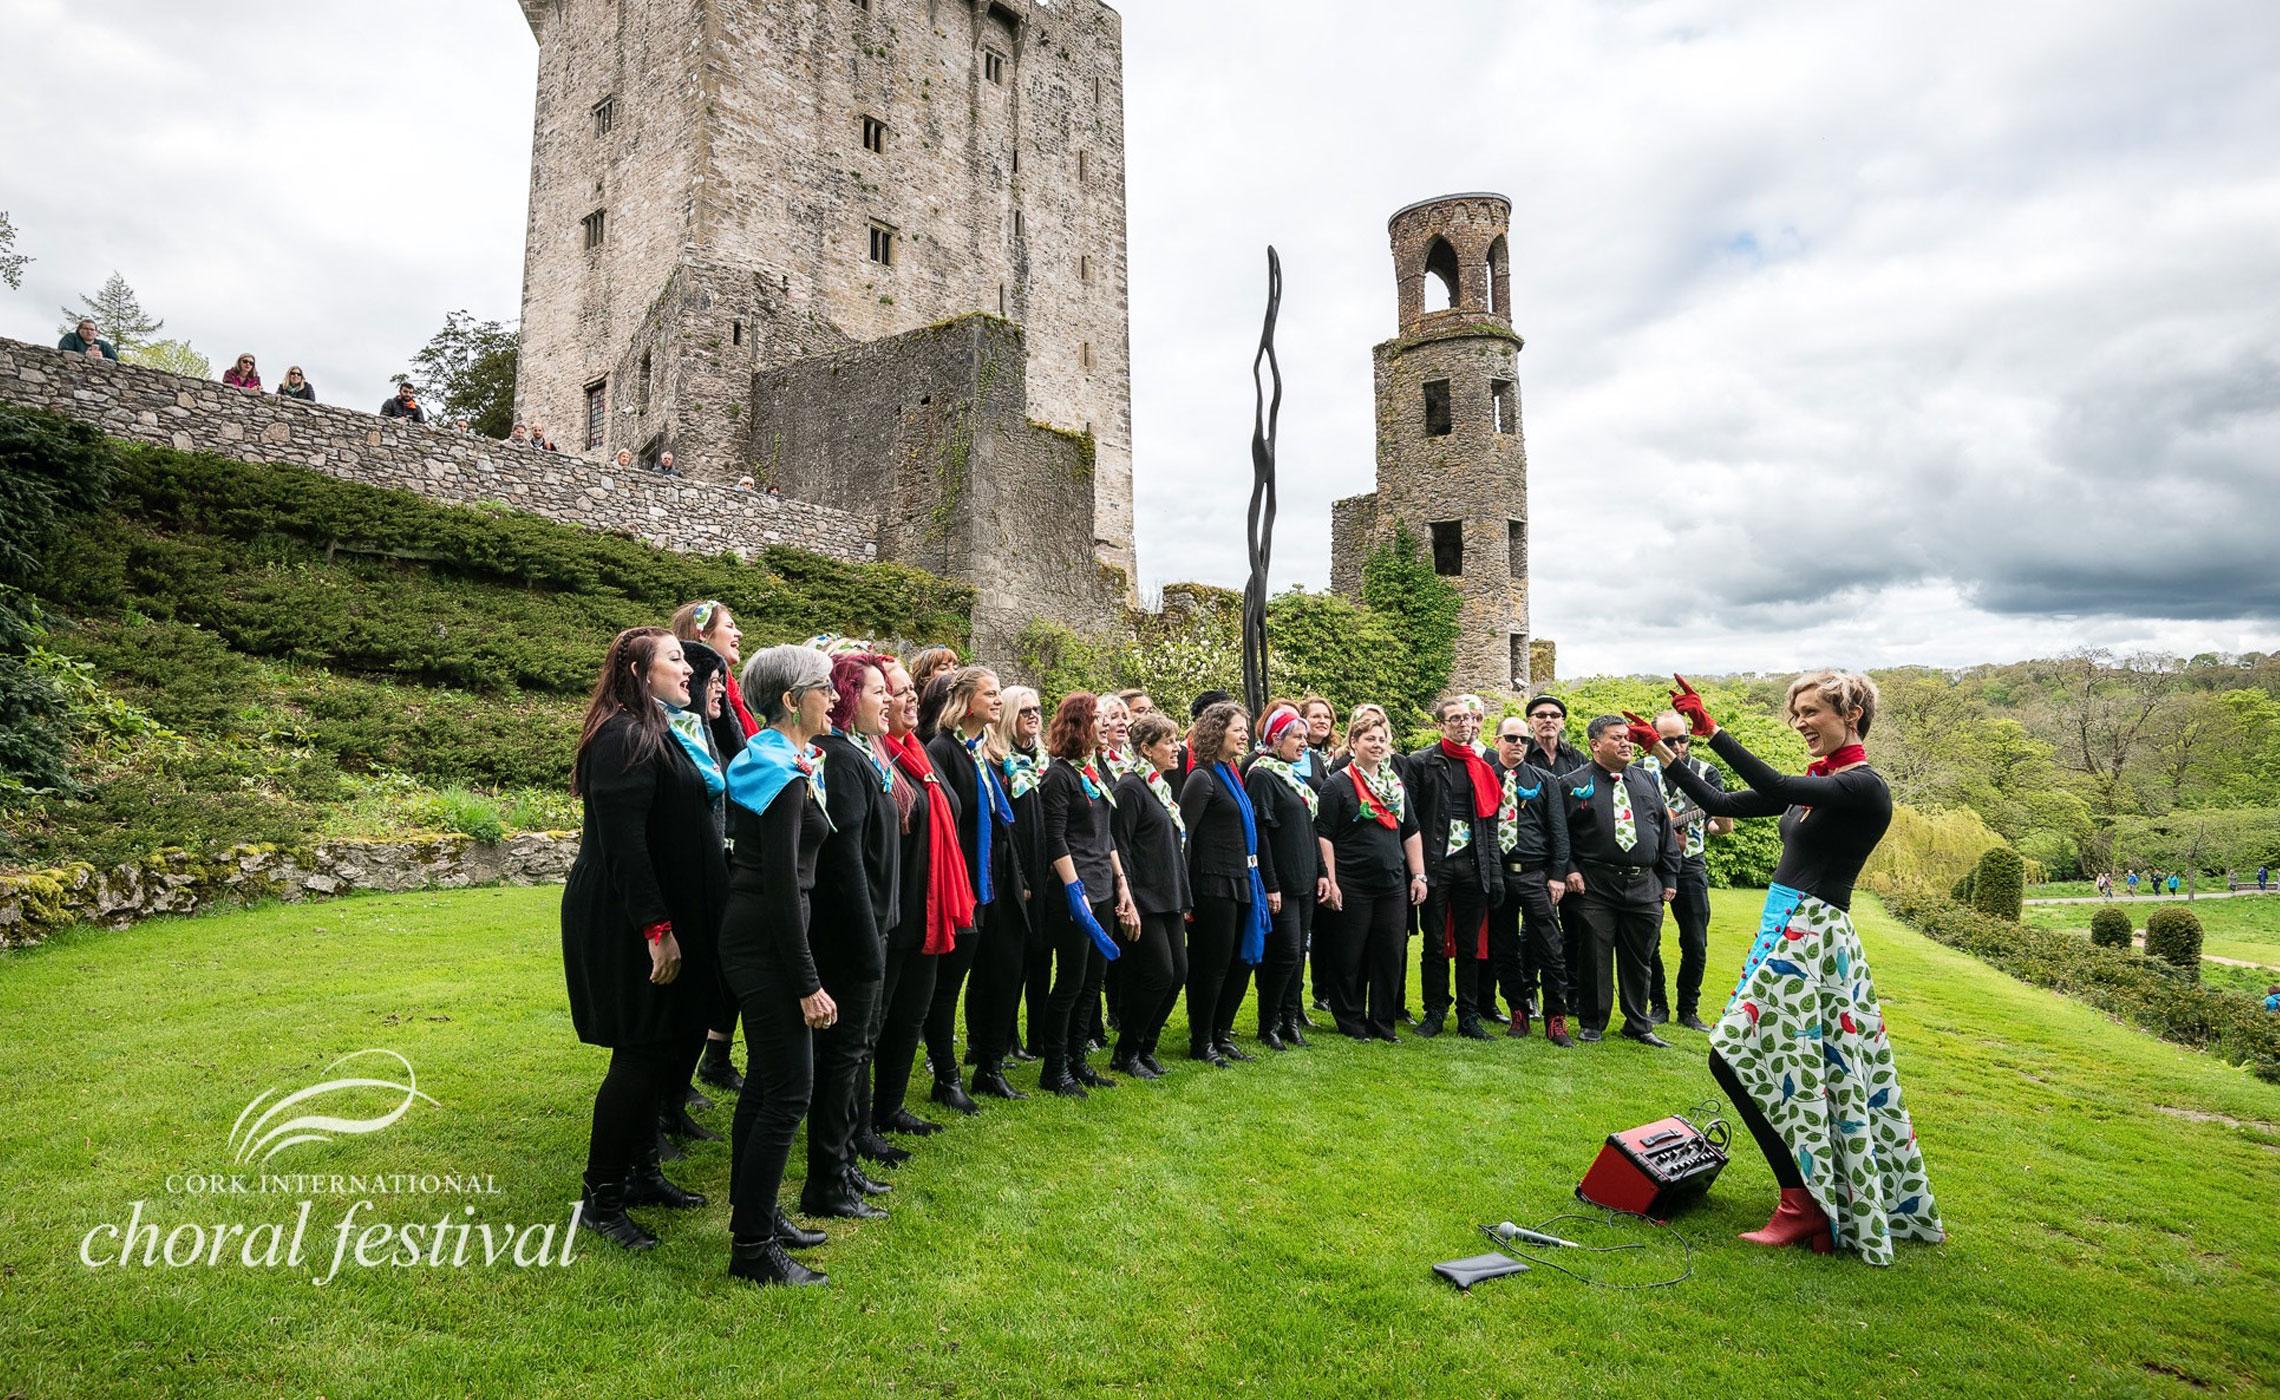 Nicki singing in Cheep Trill Choir at Blarney Castle in Ireland